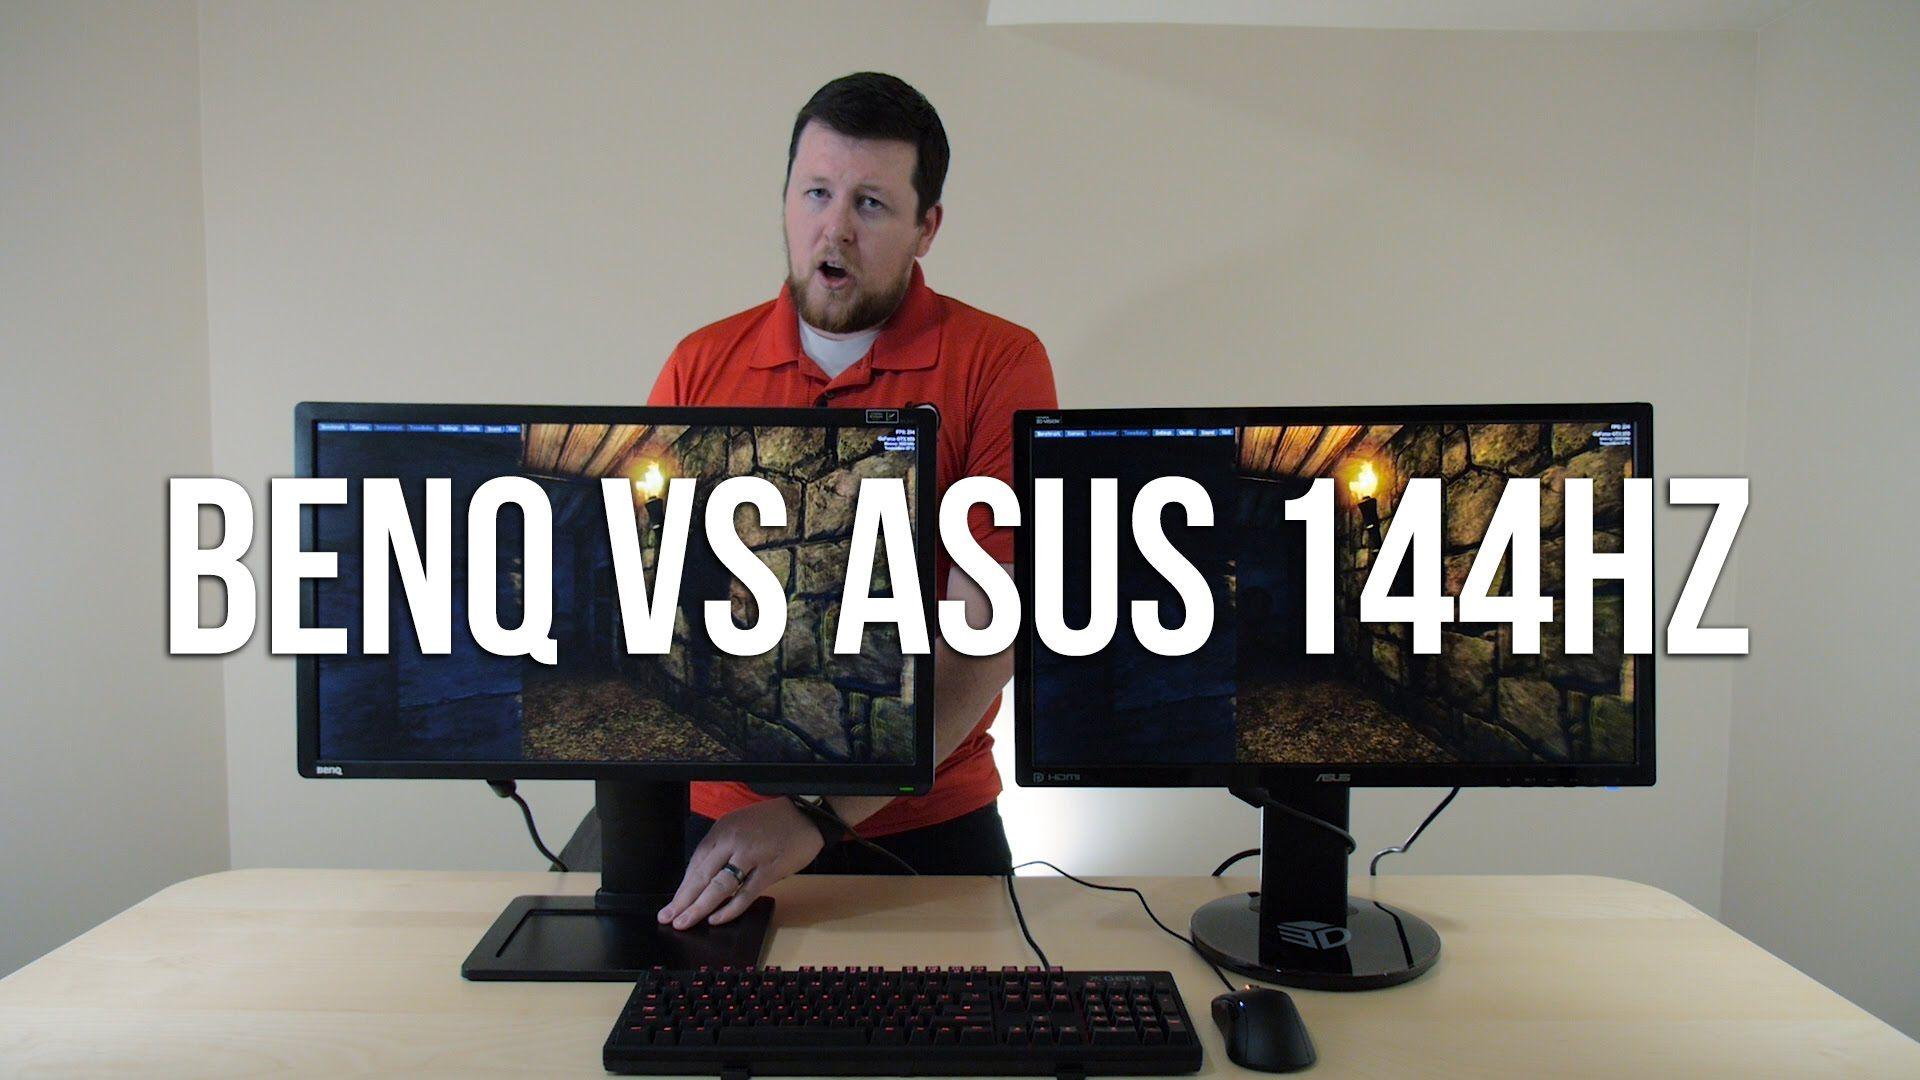 BenQ XL2411Z vs ASUS VG248QE 144 hz Monitor Comparison